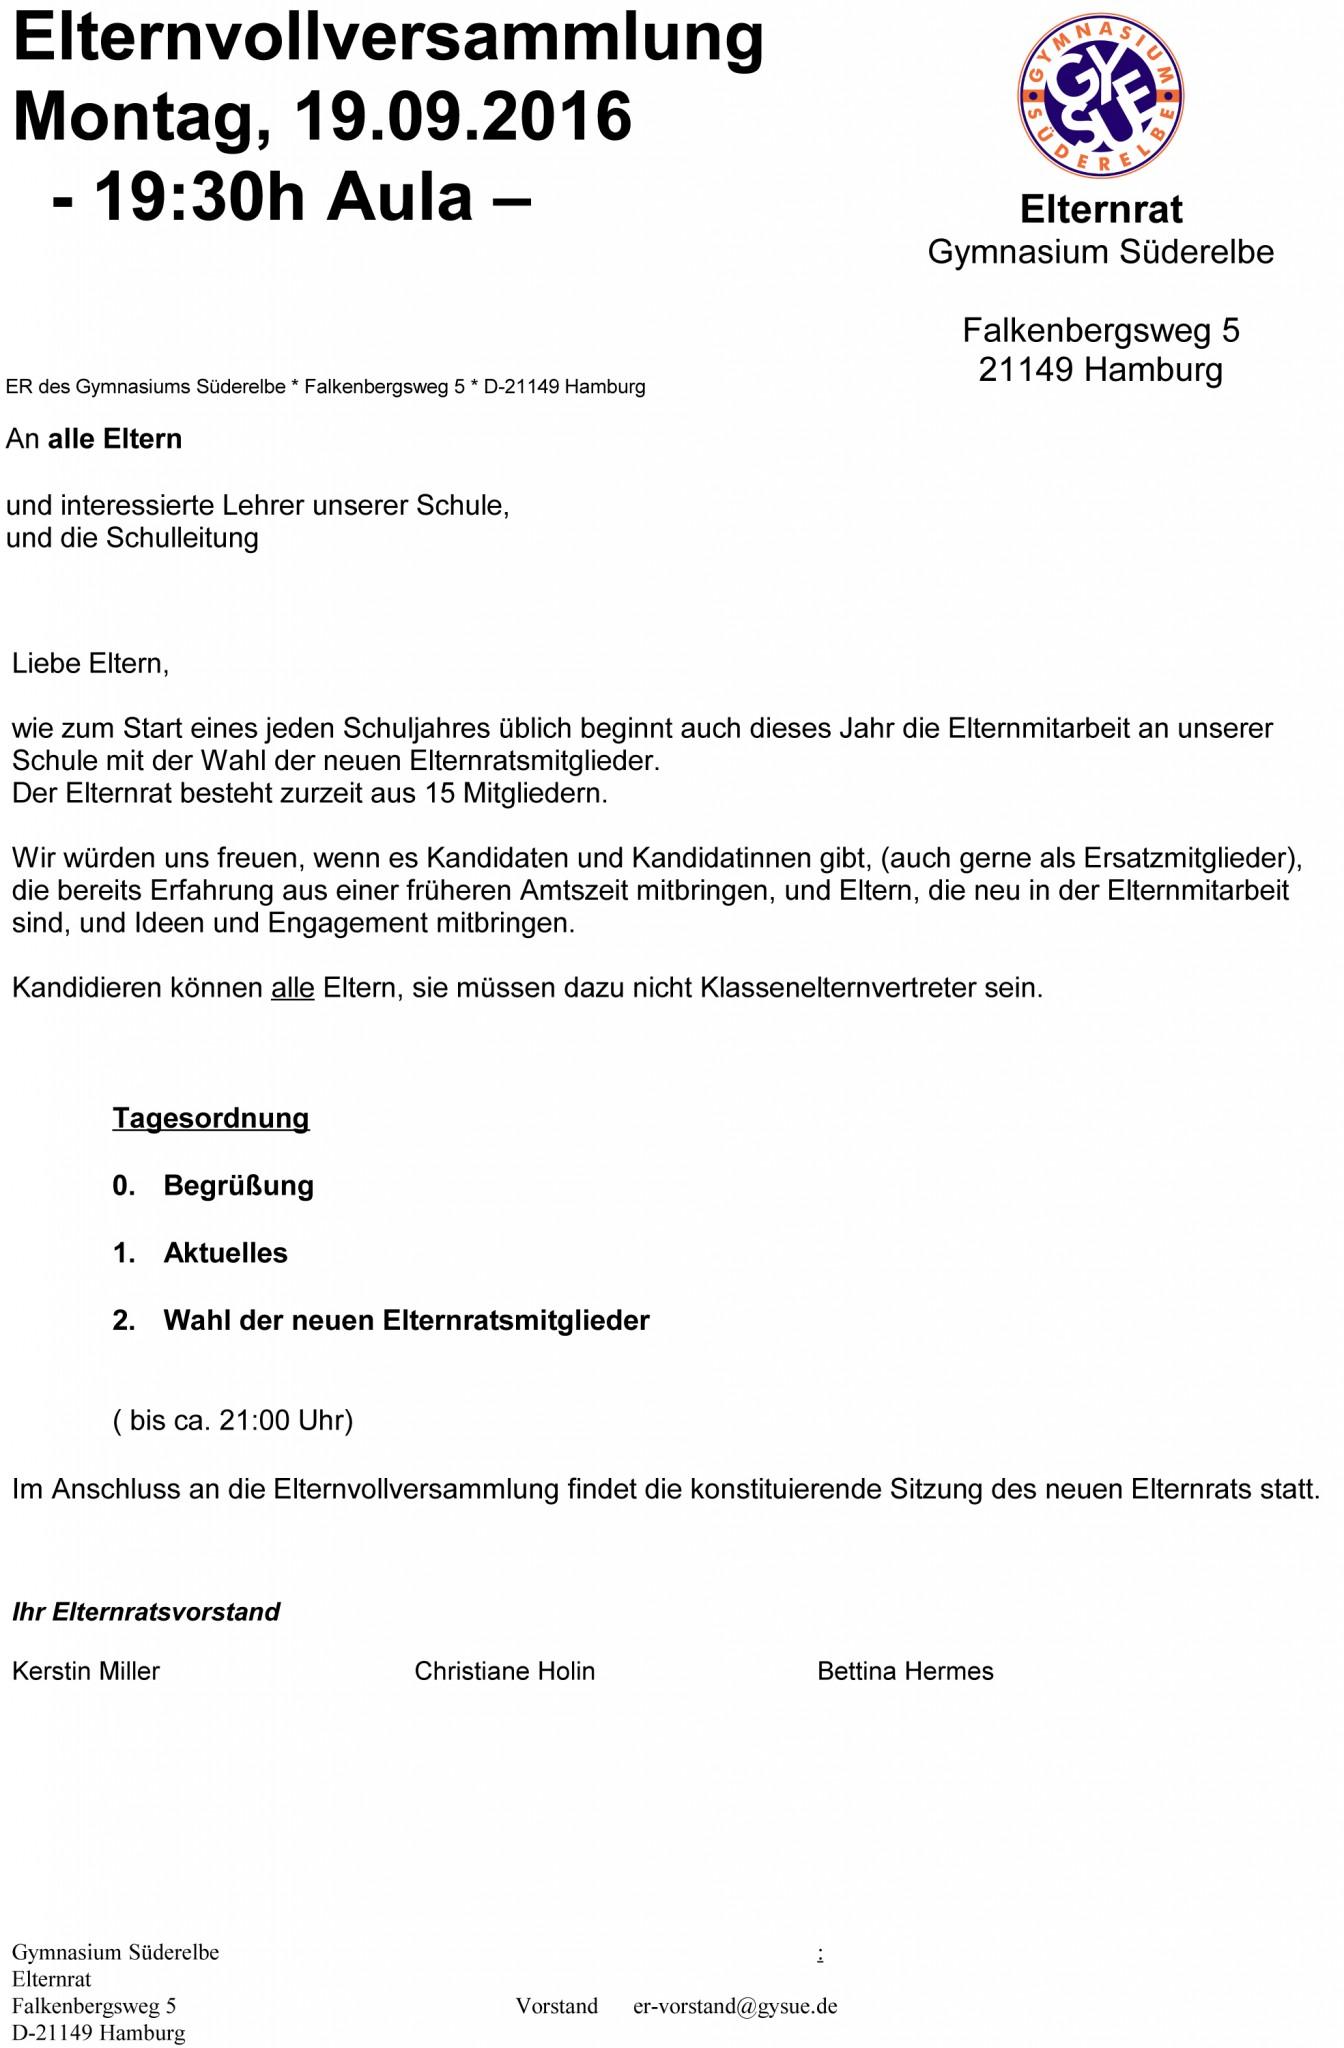 einladung-evv-19-09